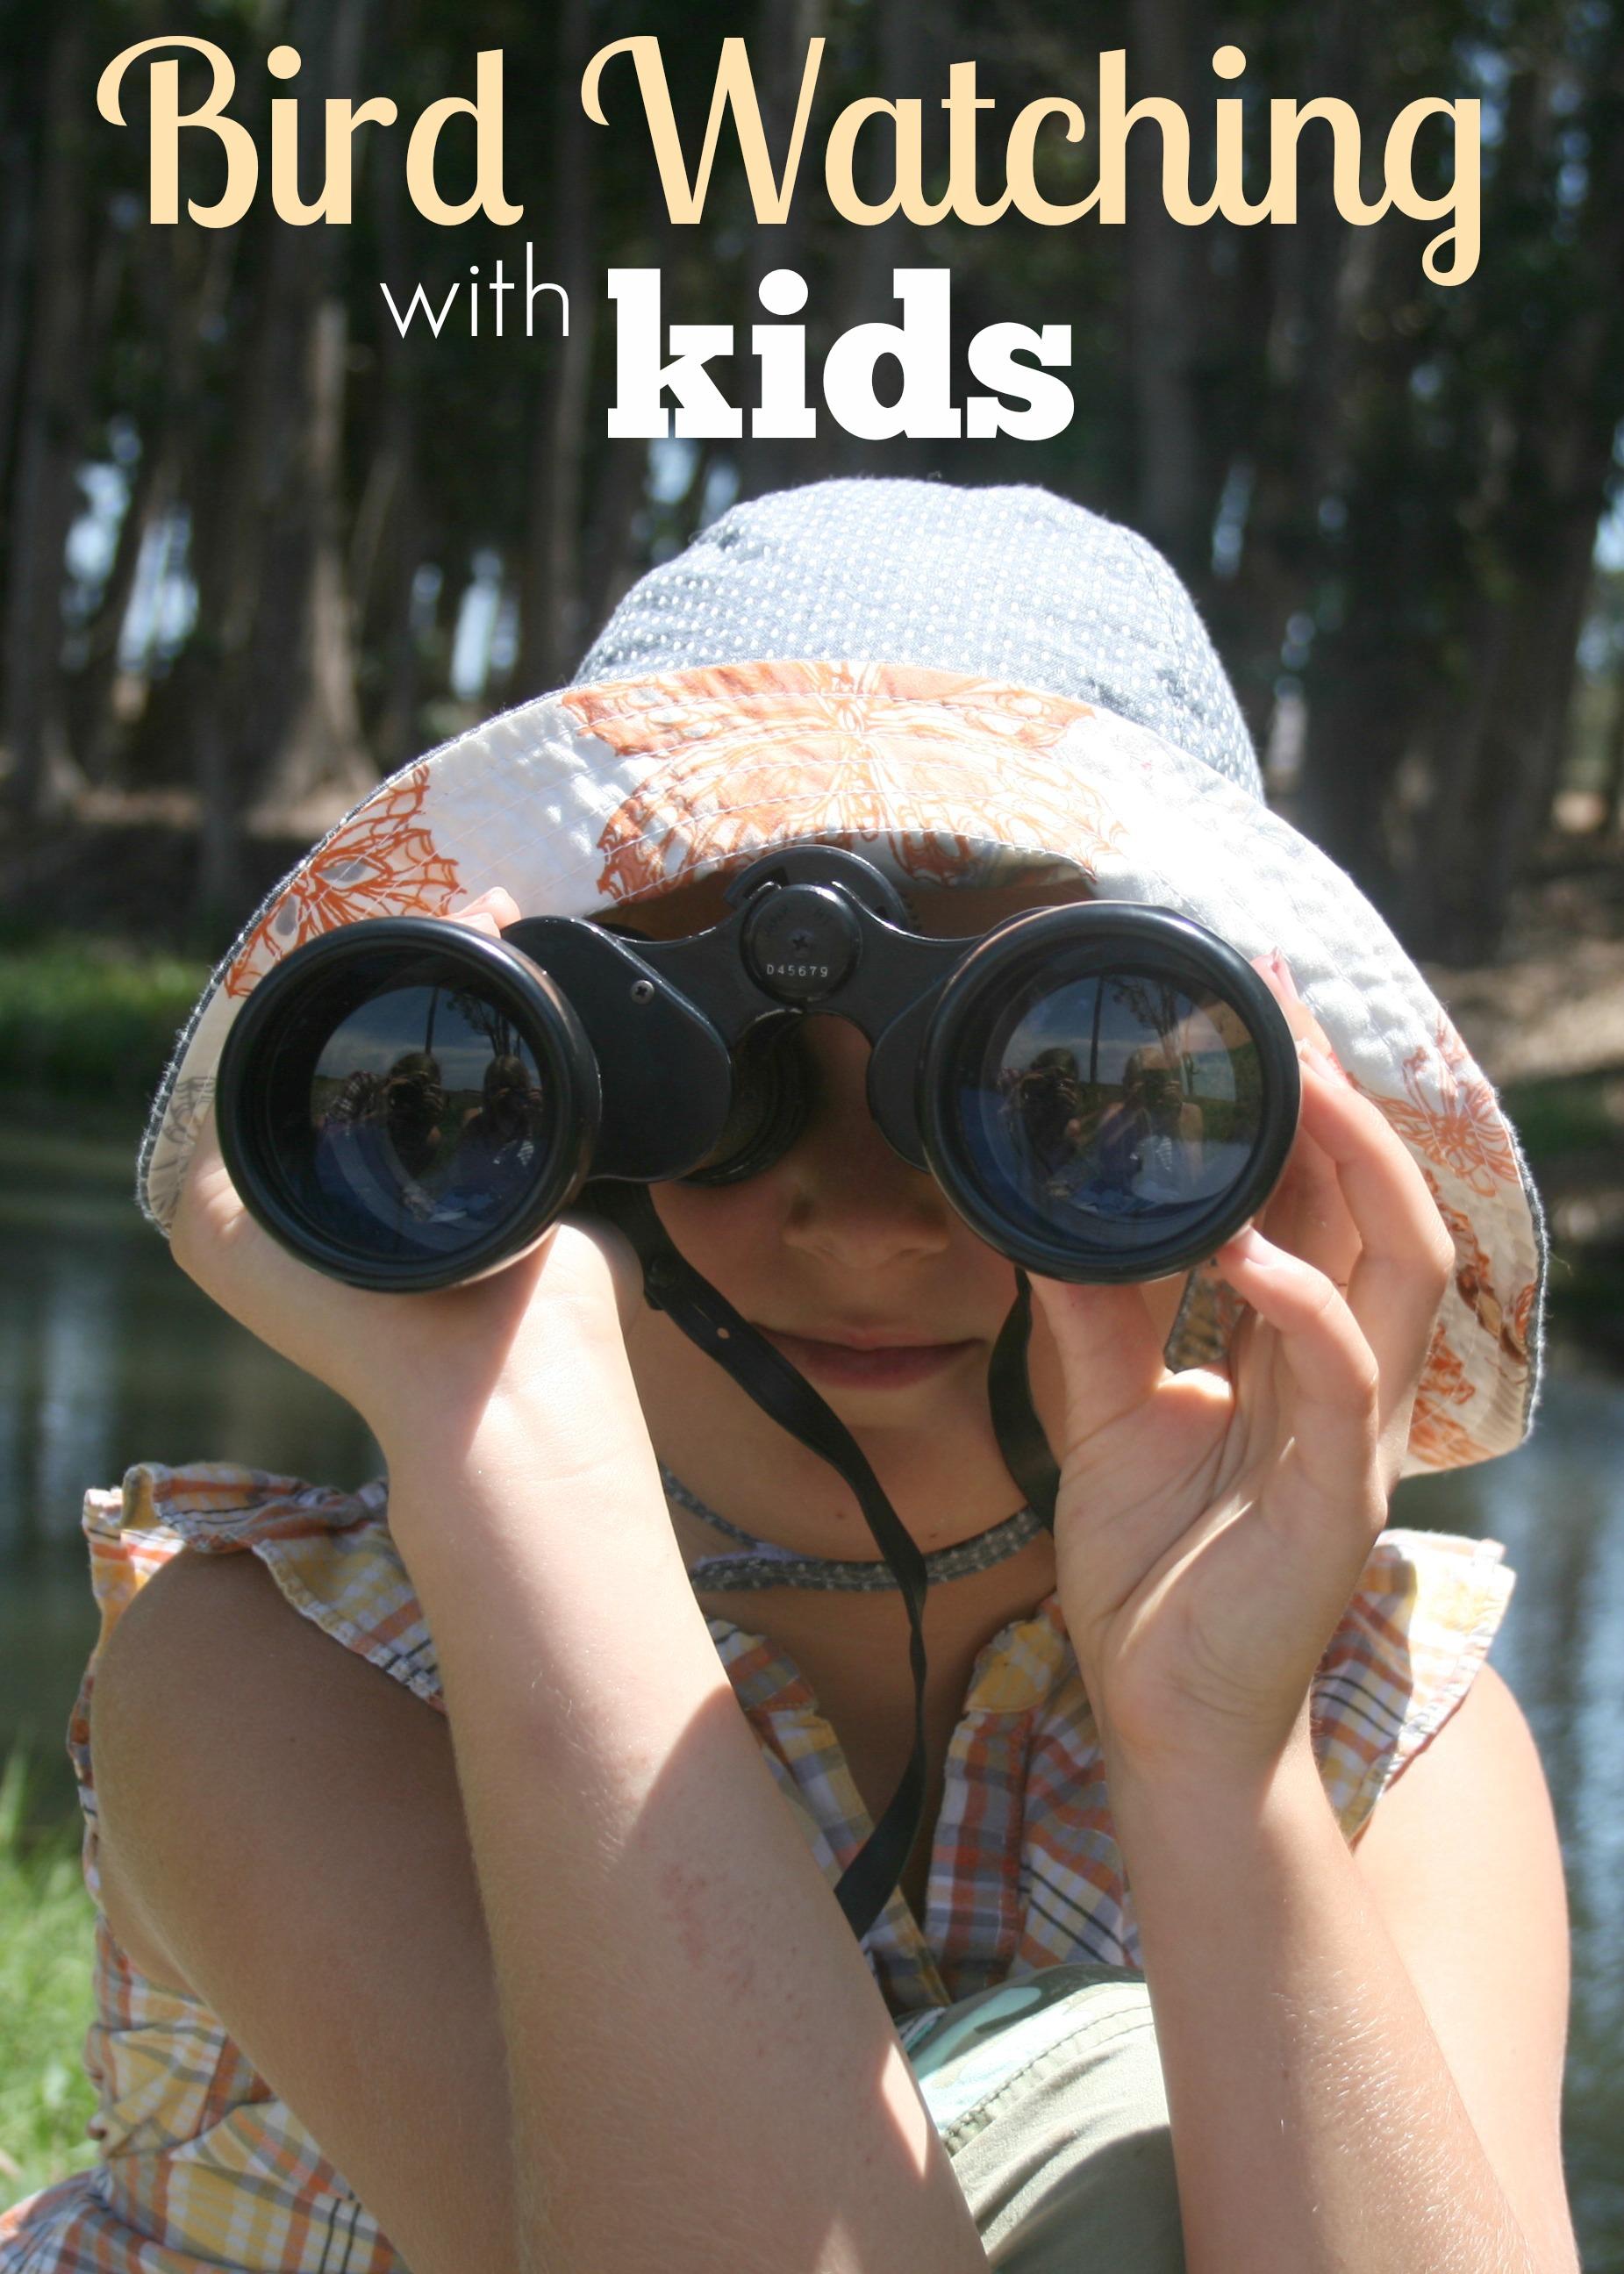 birdwatching for homeschool nature study